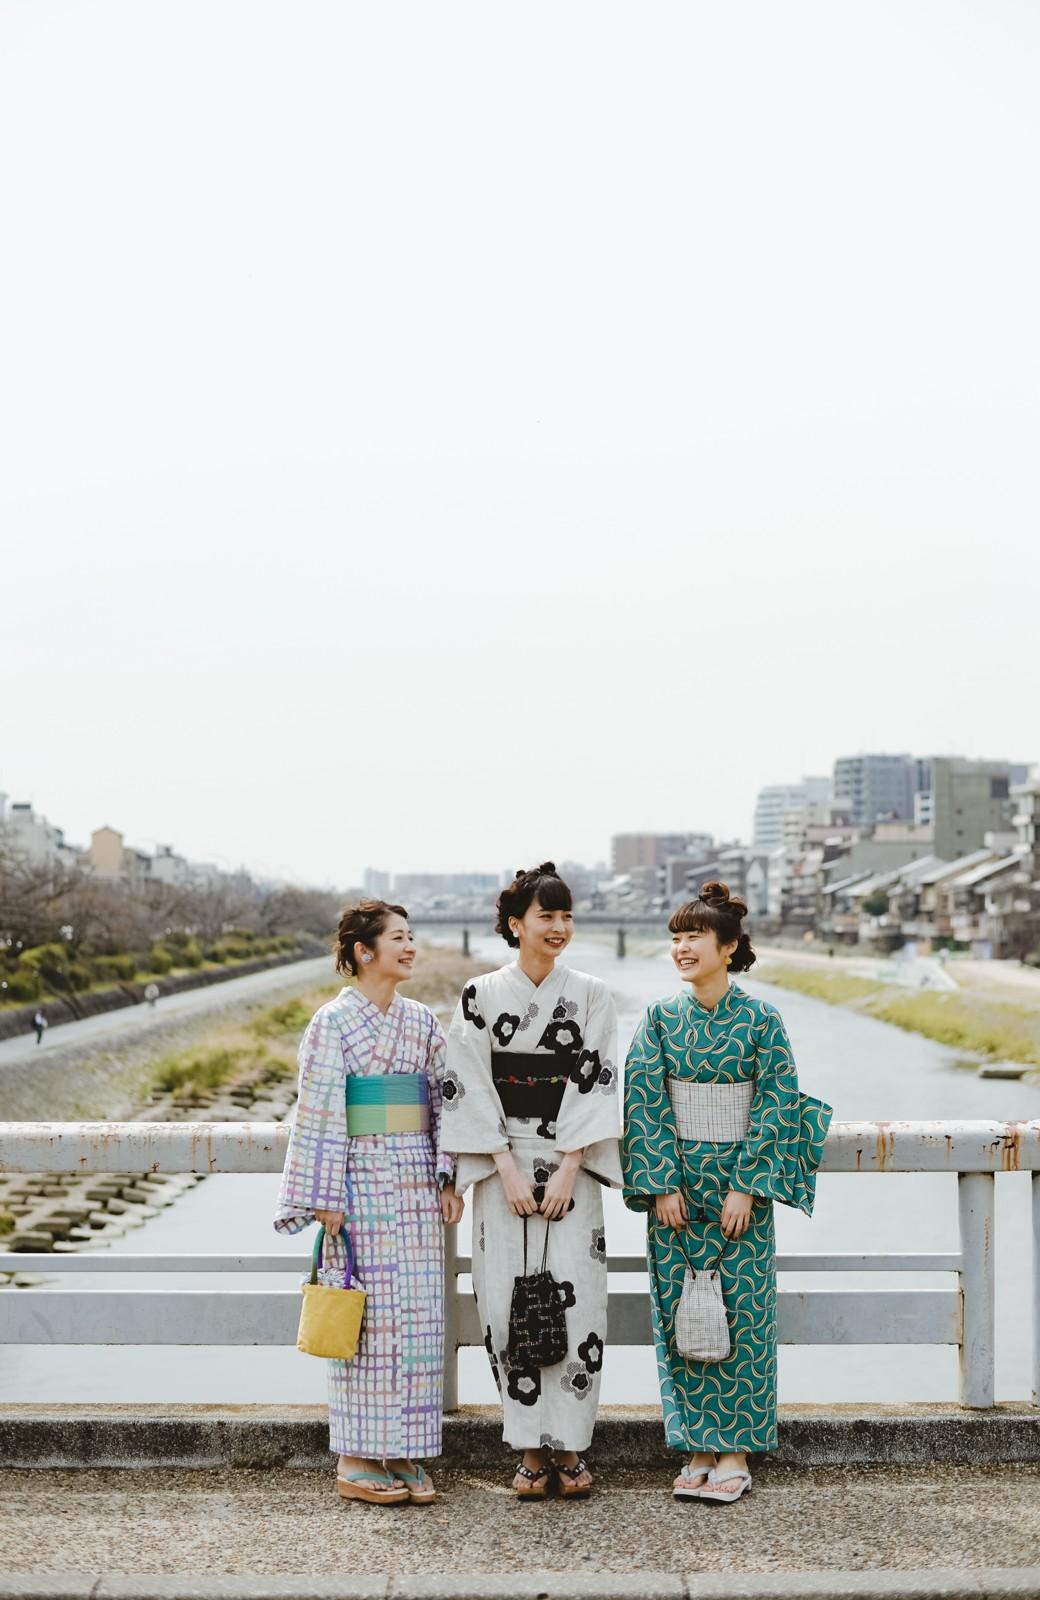 haco! ひでや工房 京都のへこ帯 大格子 <カラフル>の商品写真11